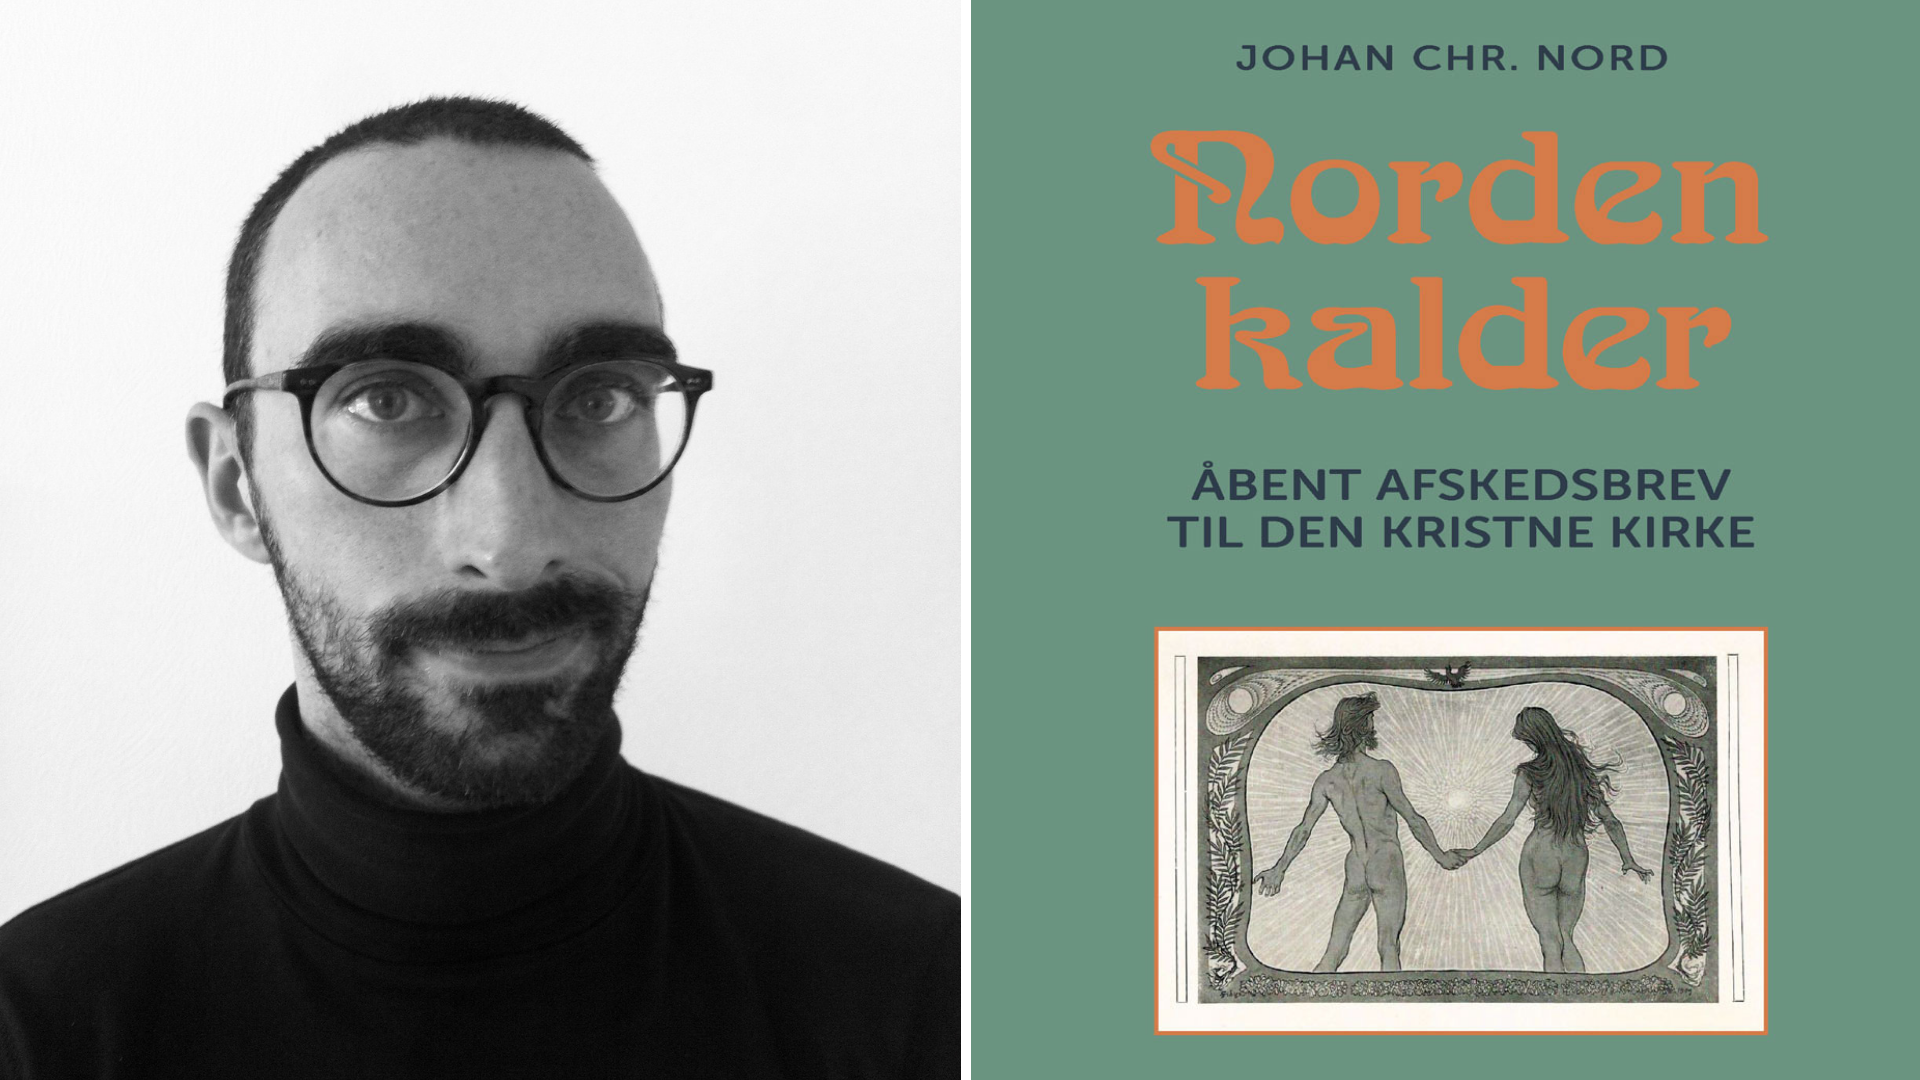 'Norden kalder' – Johan Chr. Nord